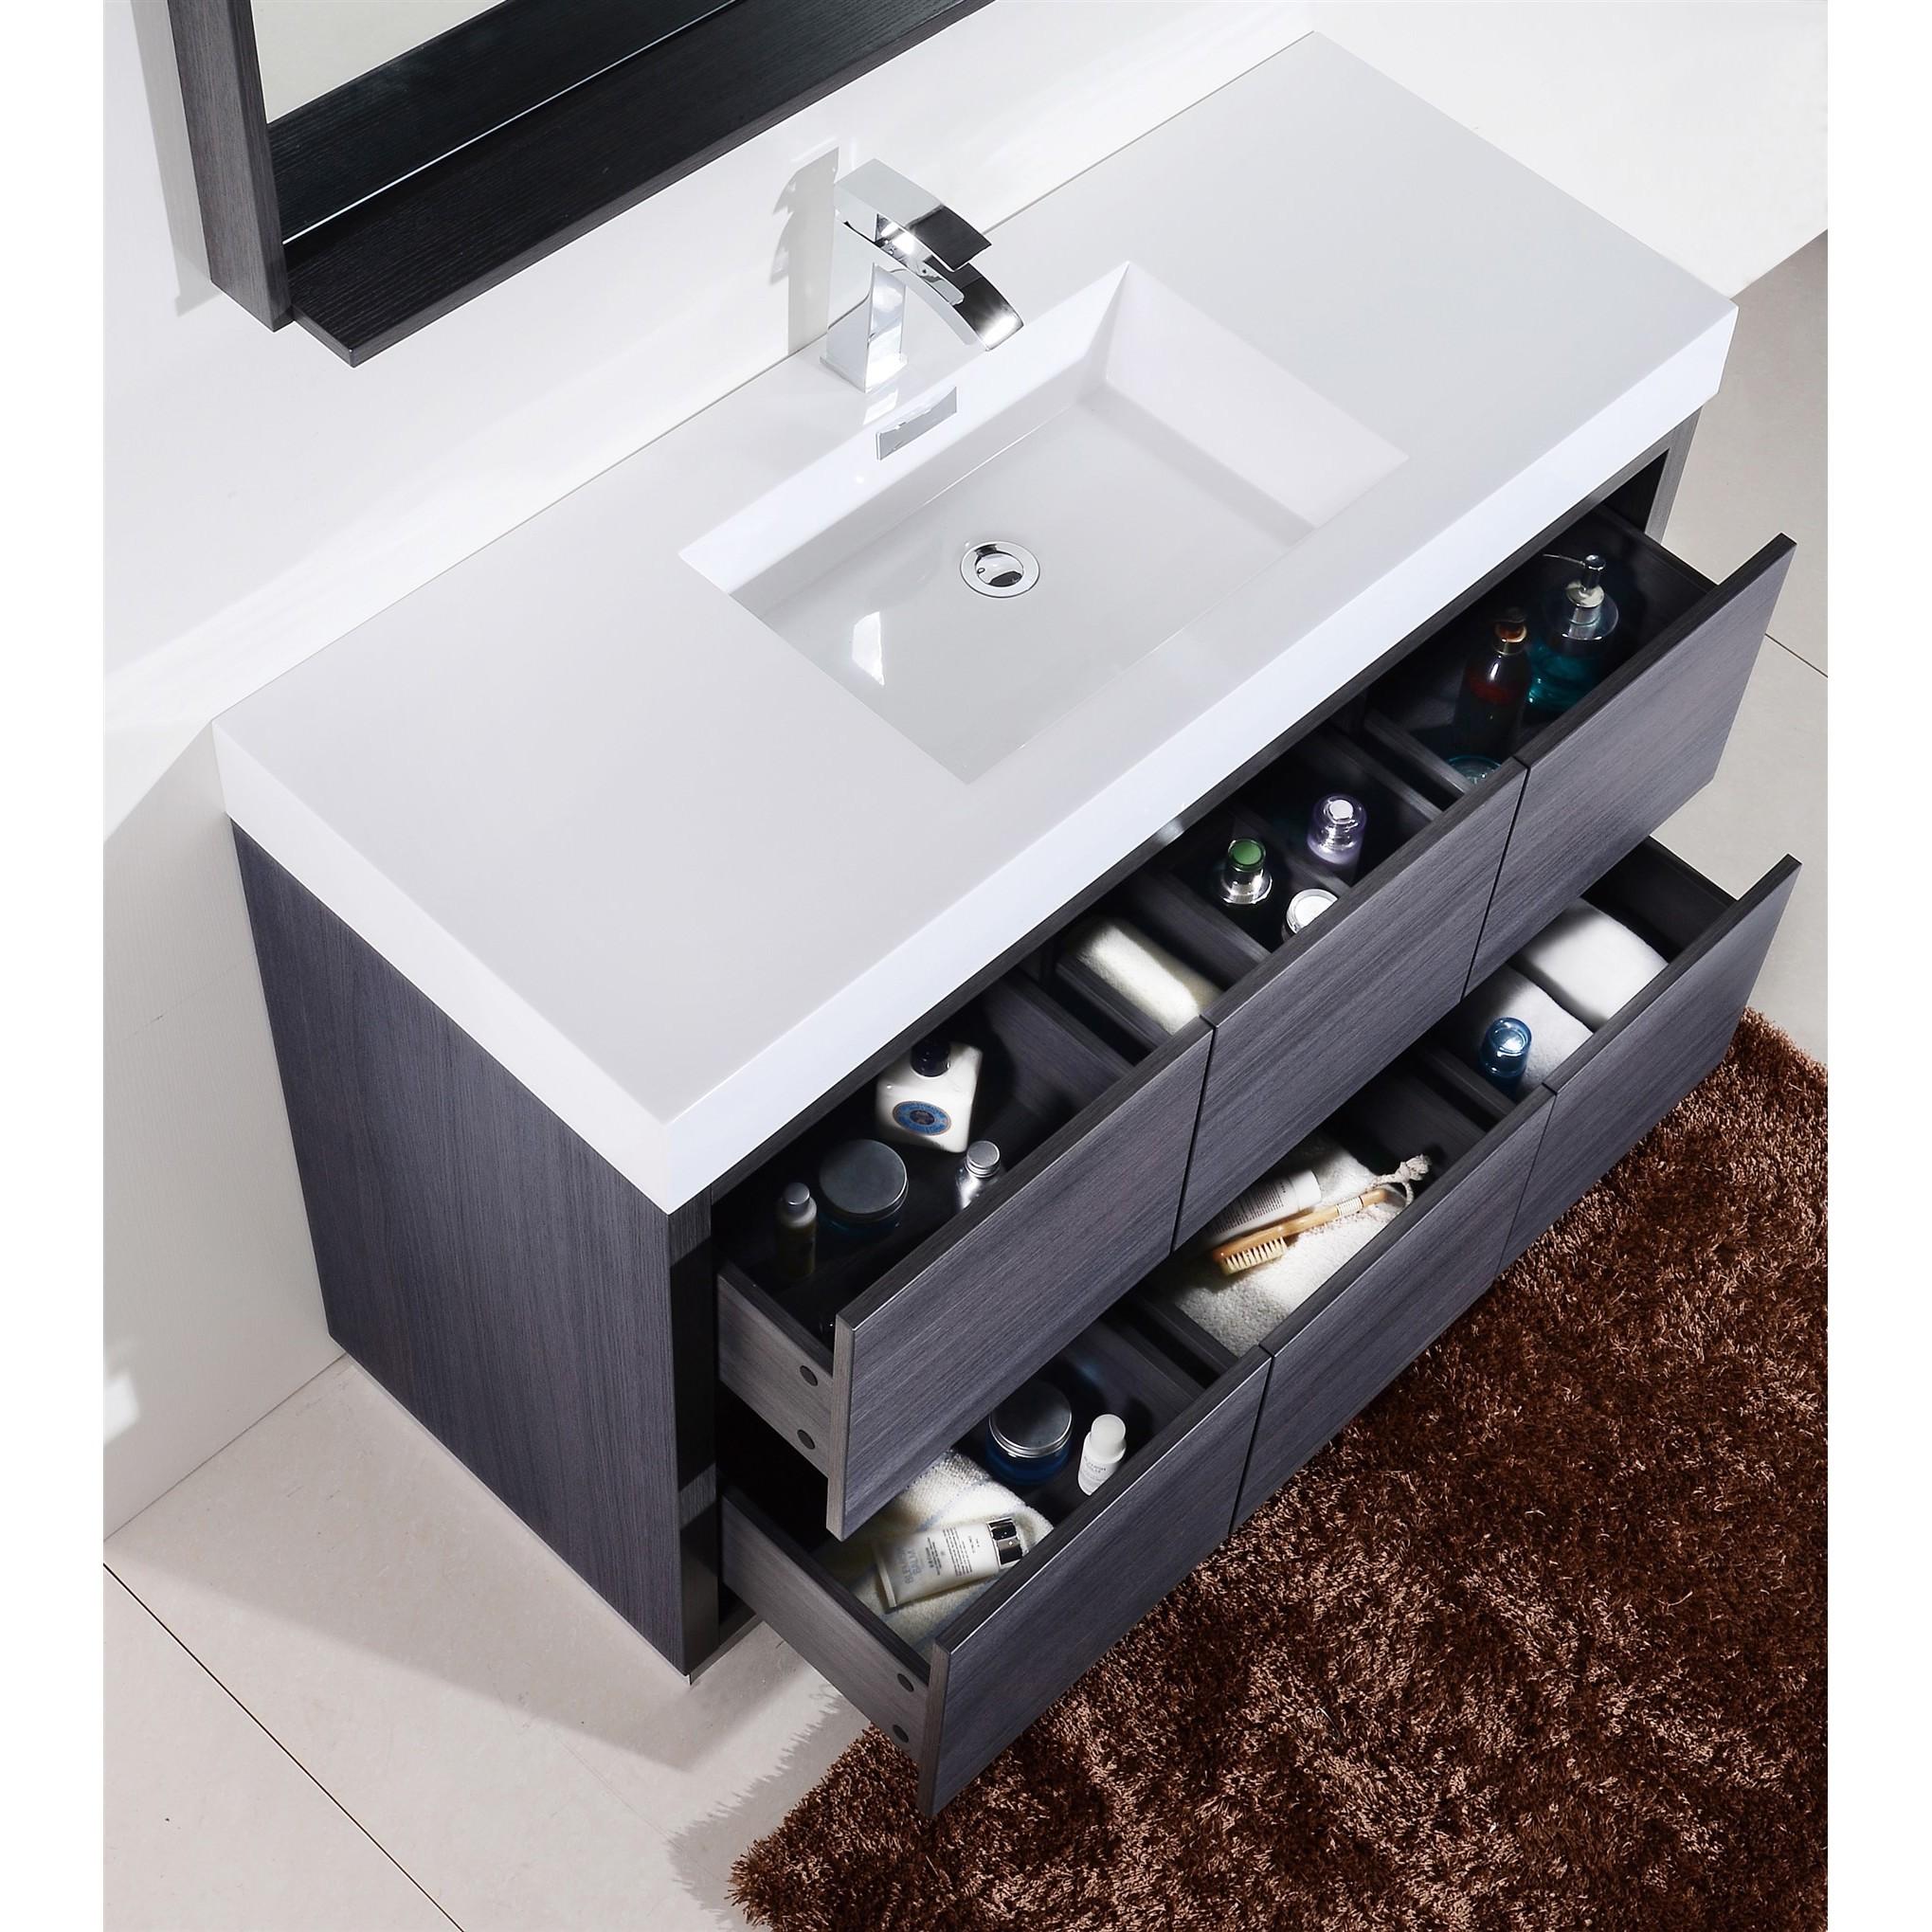 KubeBath Bliss 59 Inch Single Sink Bathroom Vanity   Free Shipping Today    Overstock.com   18807446